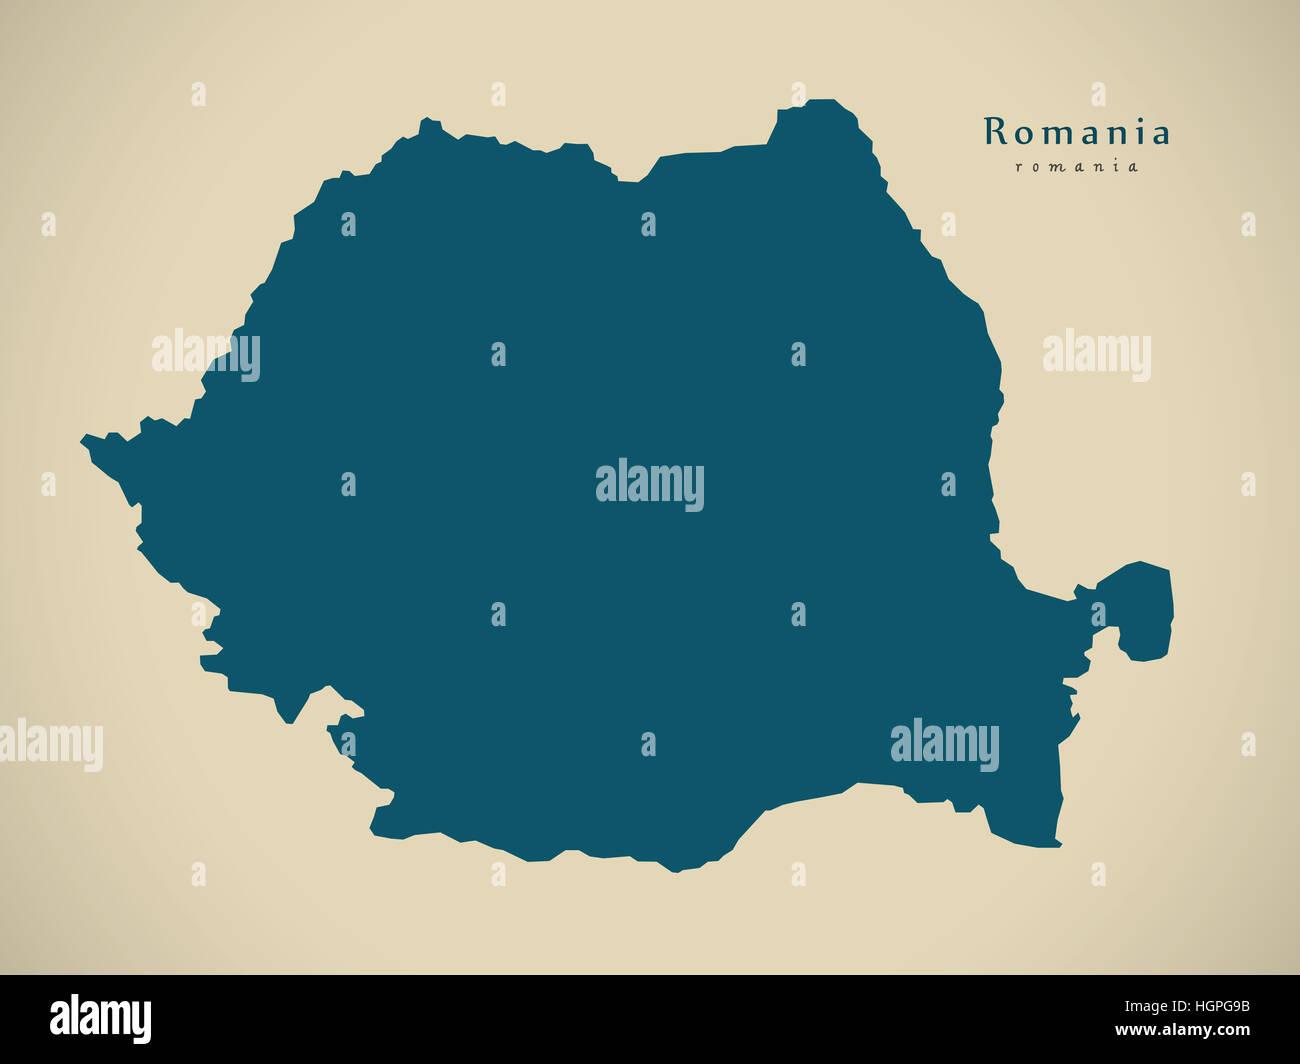 Modern Map - Romania RO illustration - Stock Image